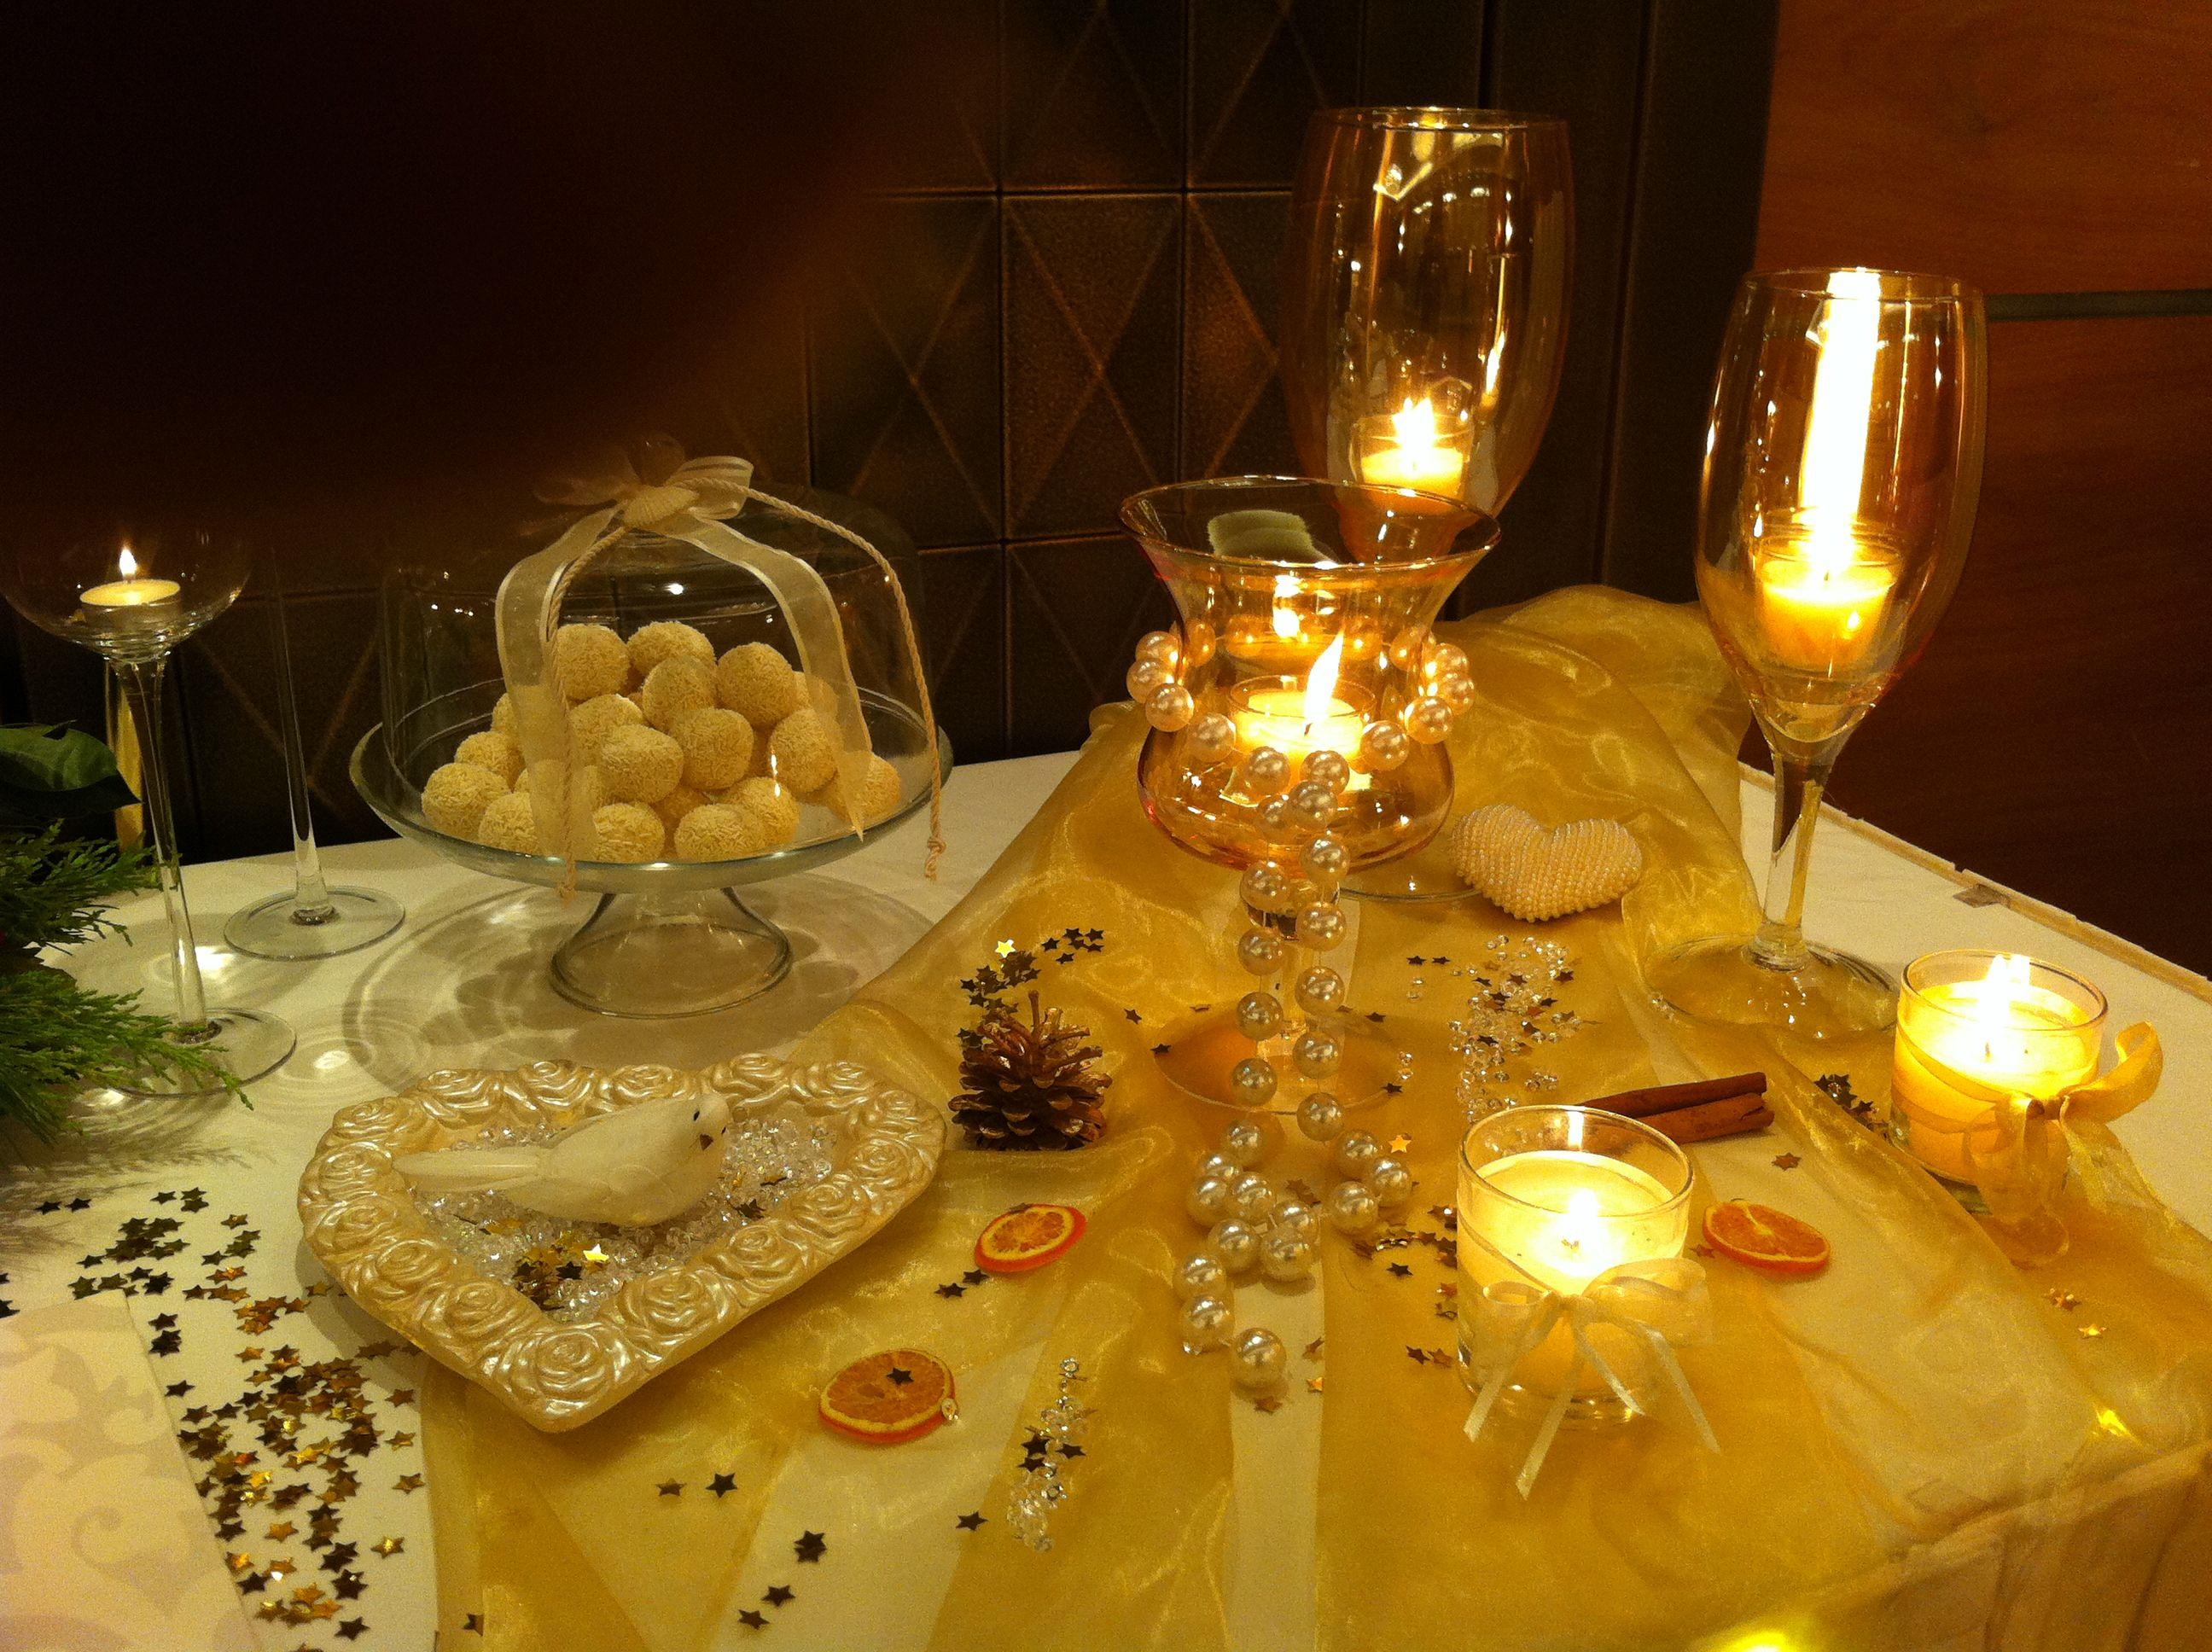 ba7f34c04c9b Τραπέζι γλυκών και ευχών στη δεξίωση του γάμου σε ξενοδοχείο με κουφέτα  μέσα σε γυάλες